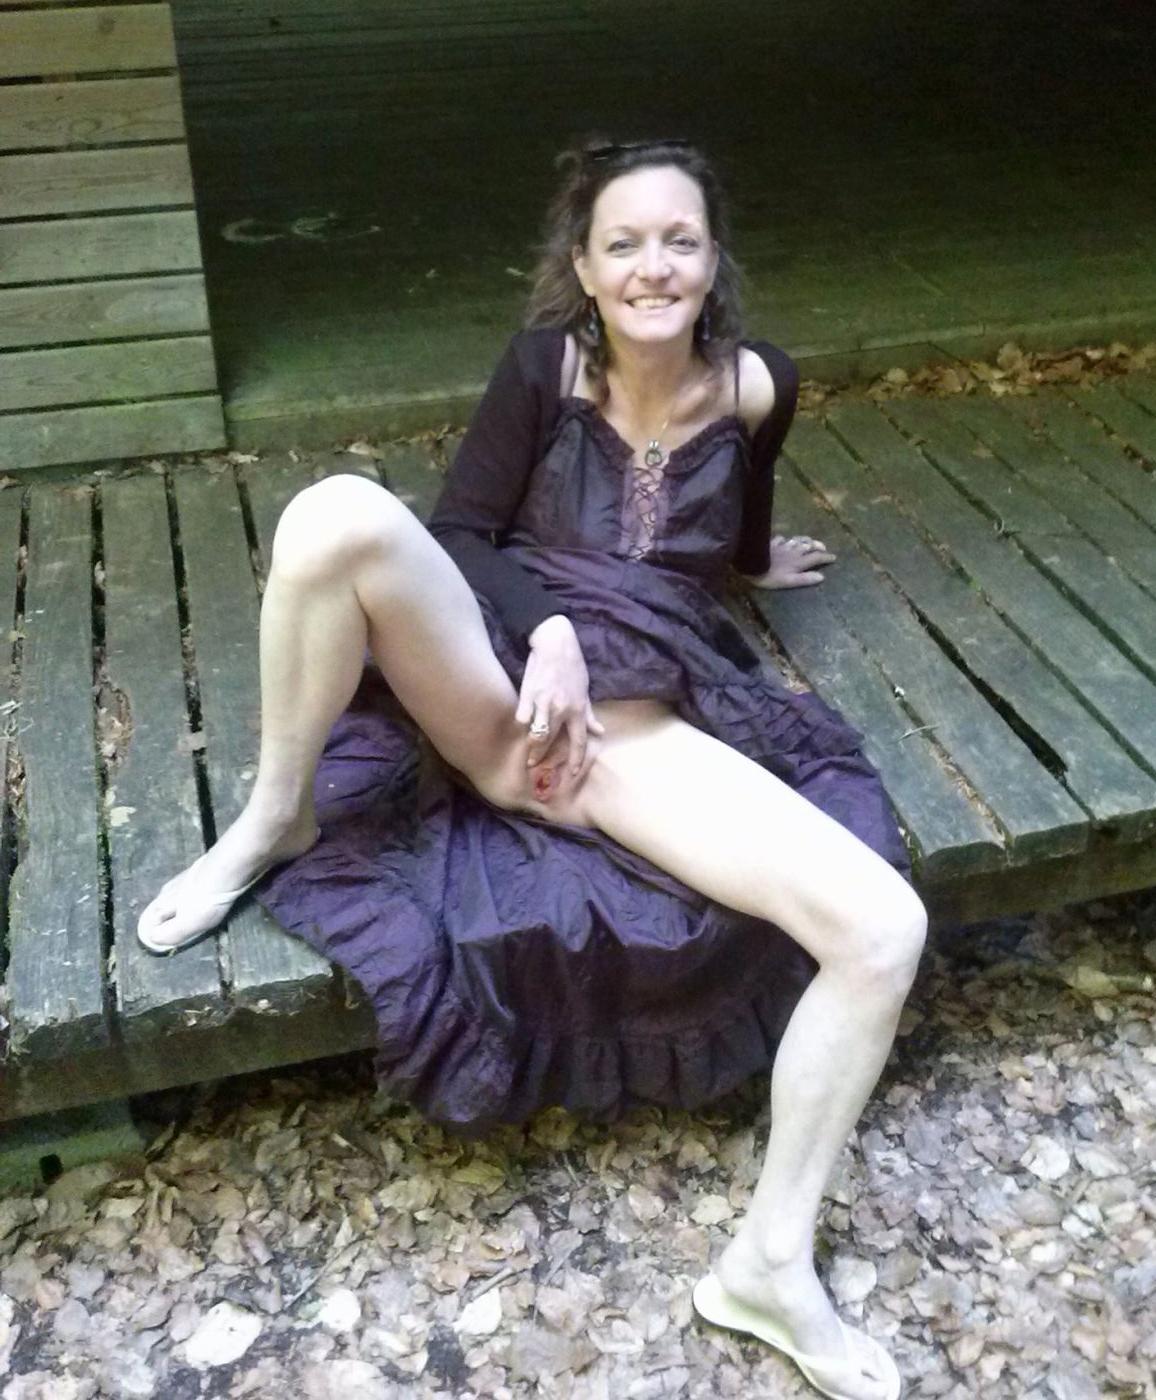 Upskirt No Panties Twerking